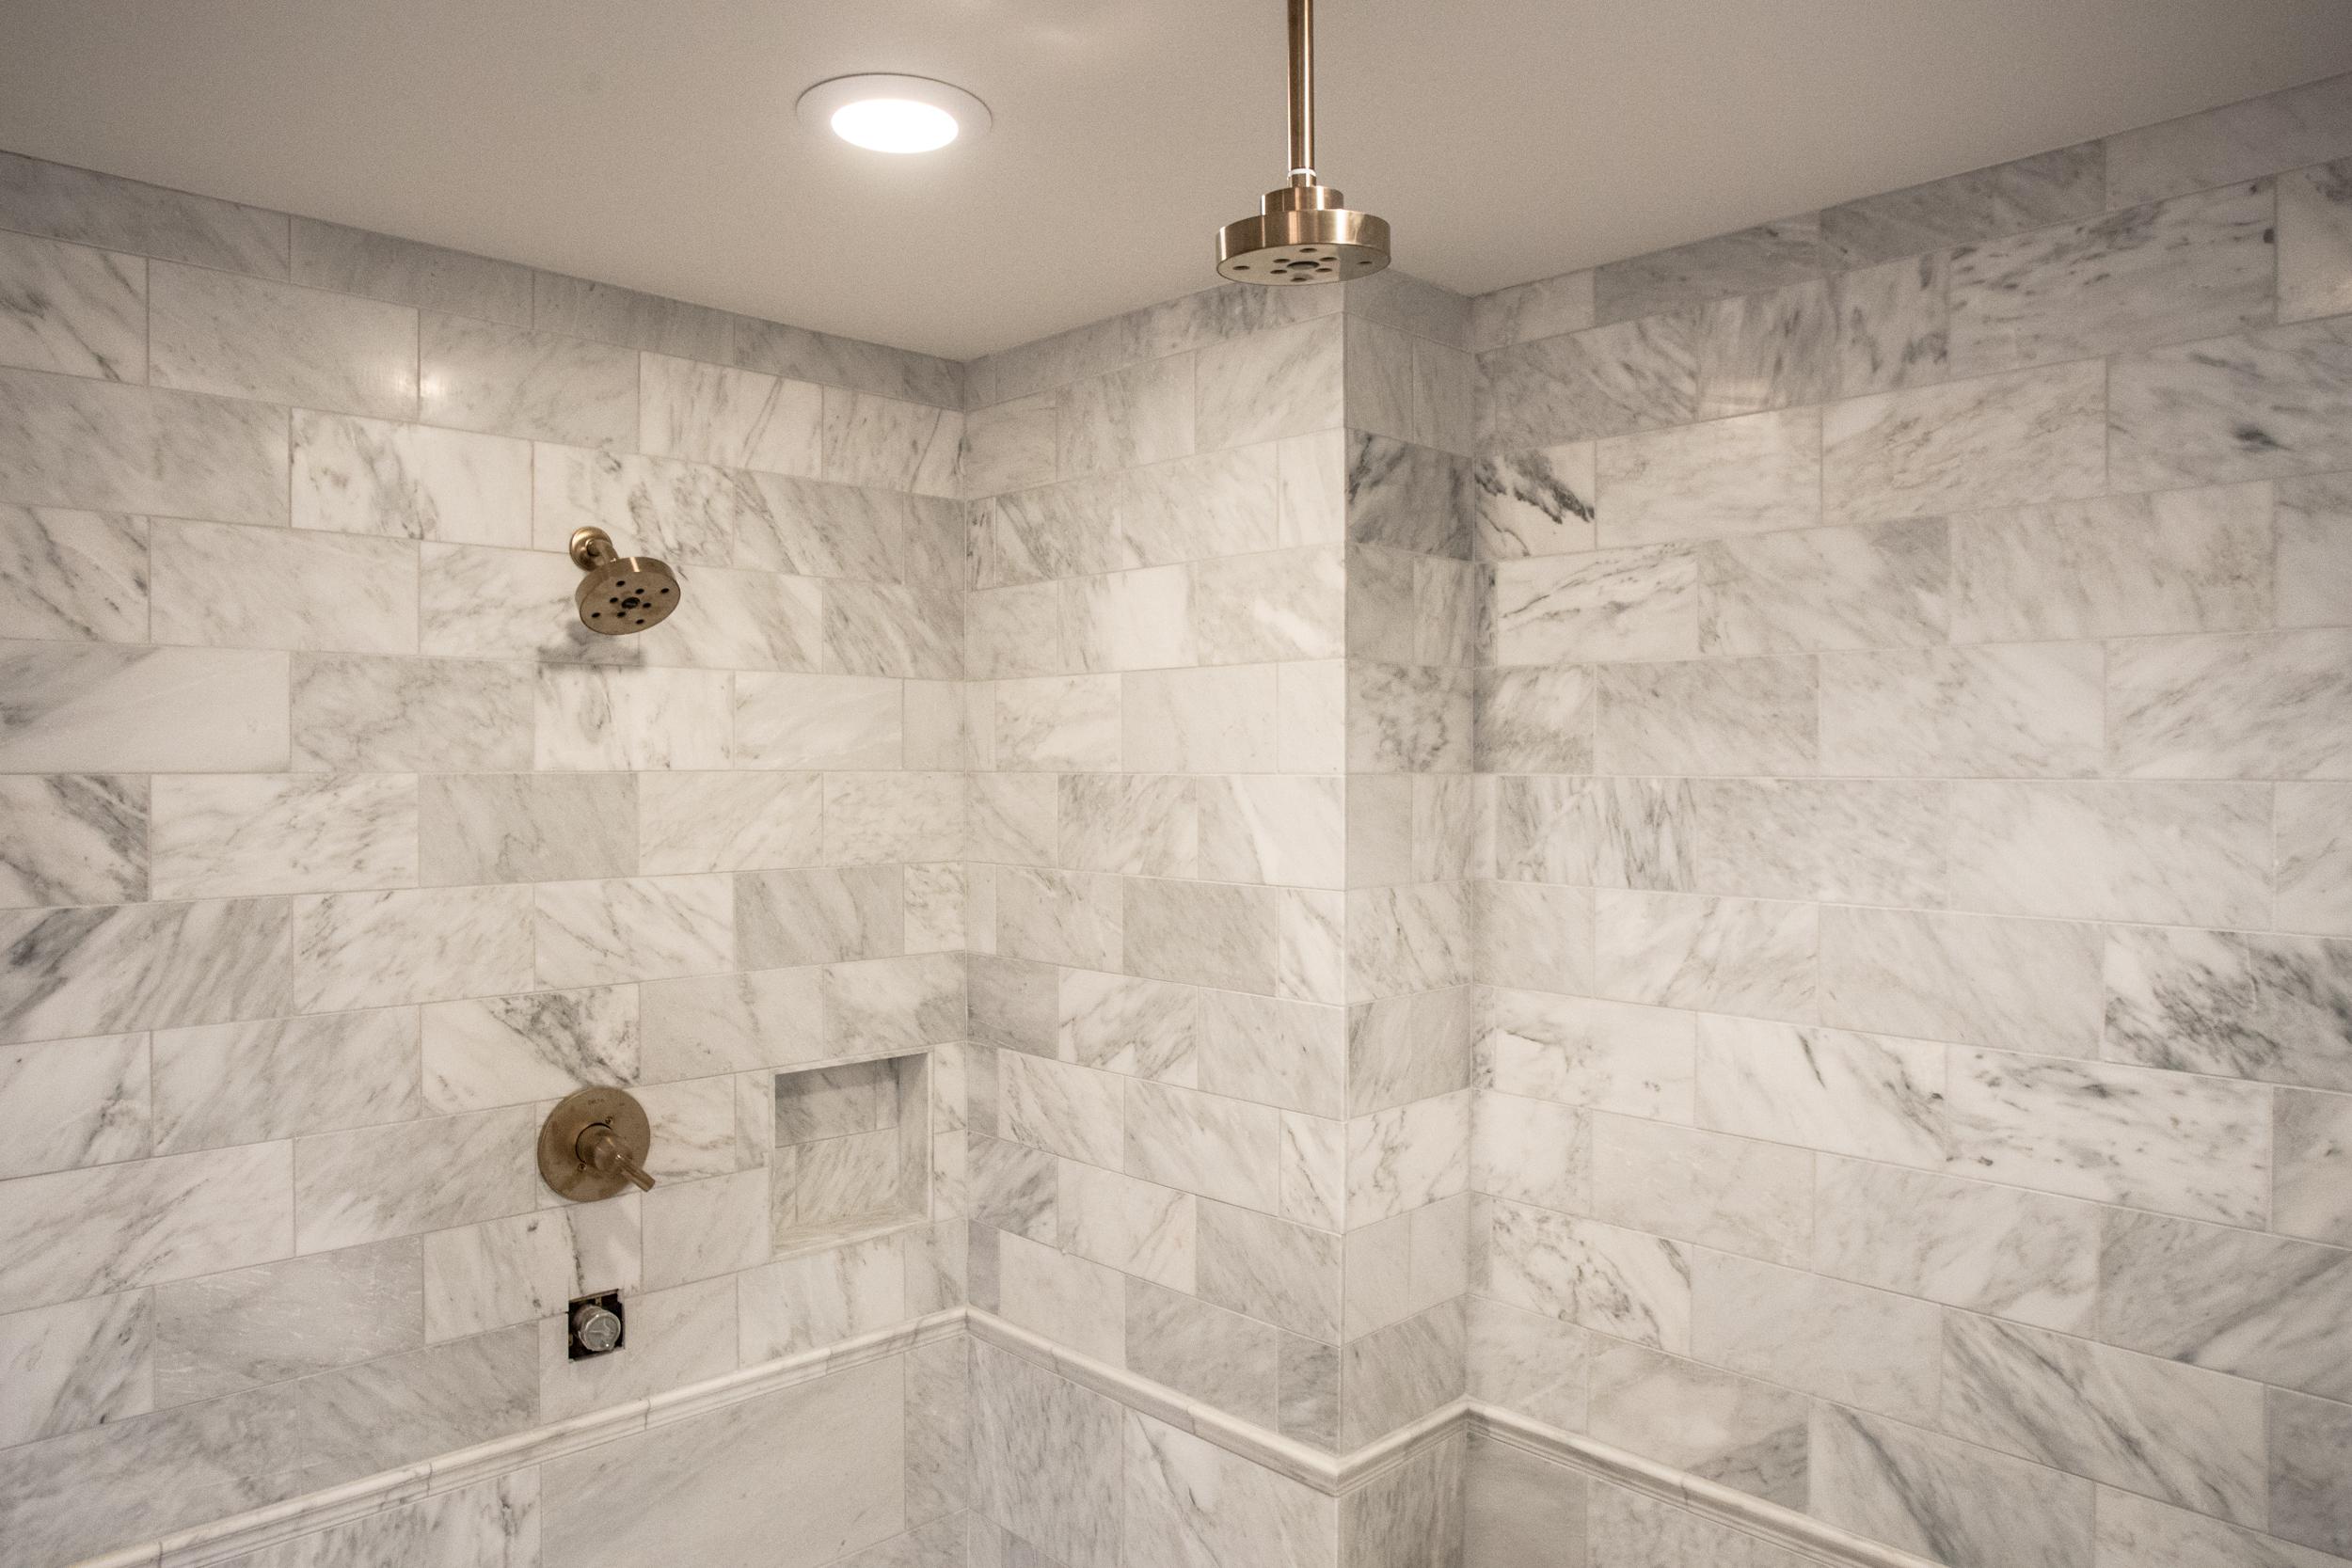 britt-development-group-nashville-tennessee-custom-home-builder-historic-restoration-0804.jpg